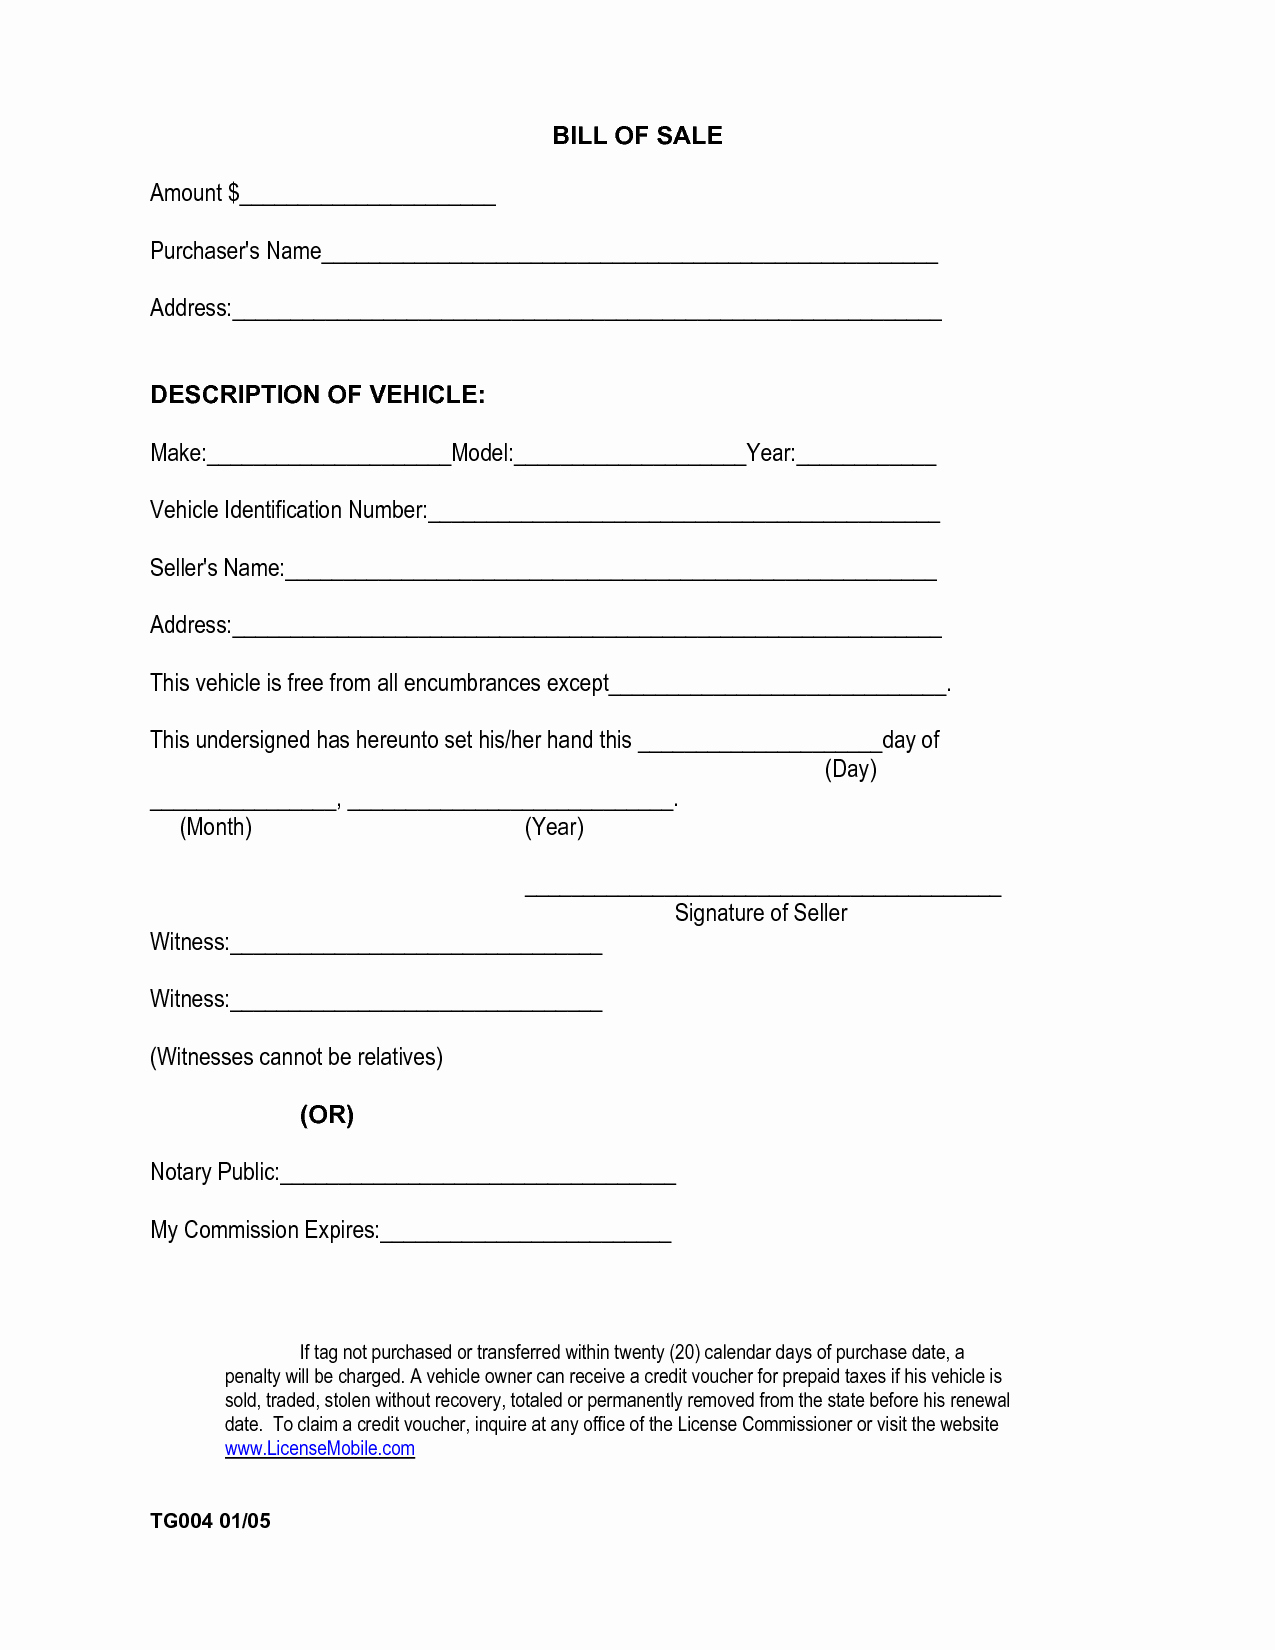 Free Bill Of Sale Printable New Printable Sample Car Bill Of Sale form